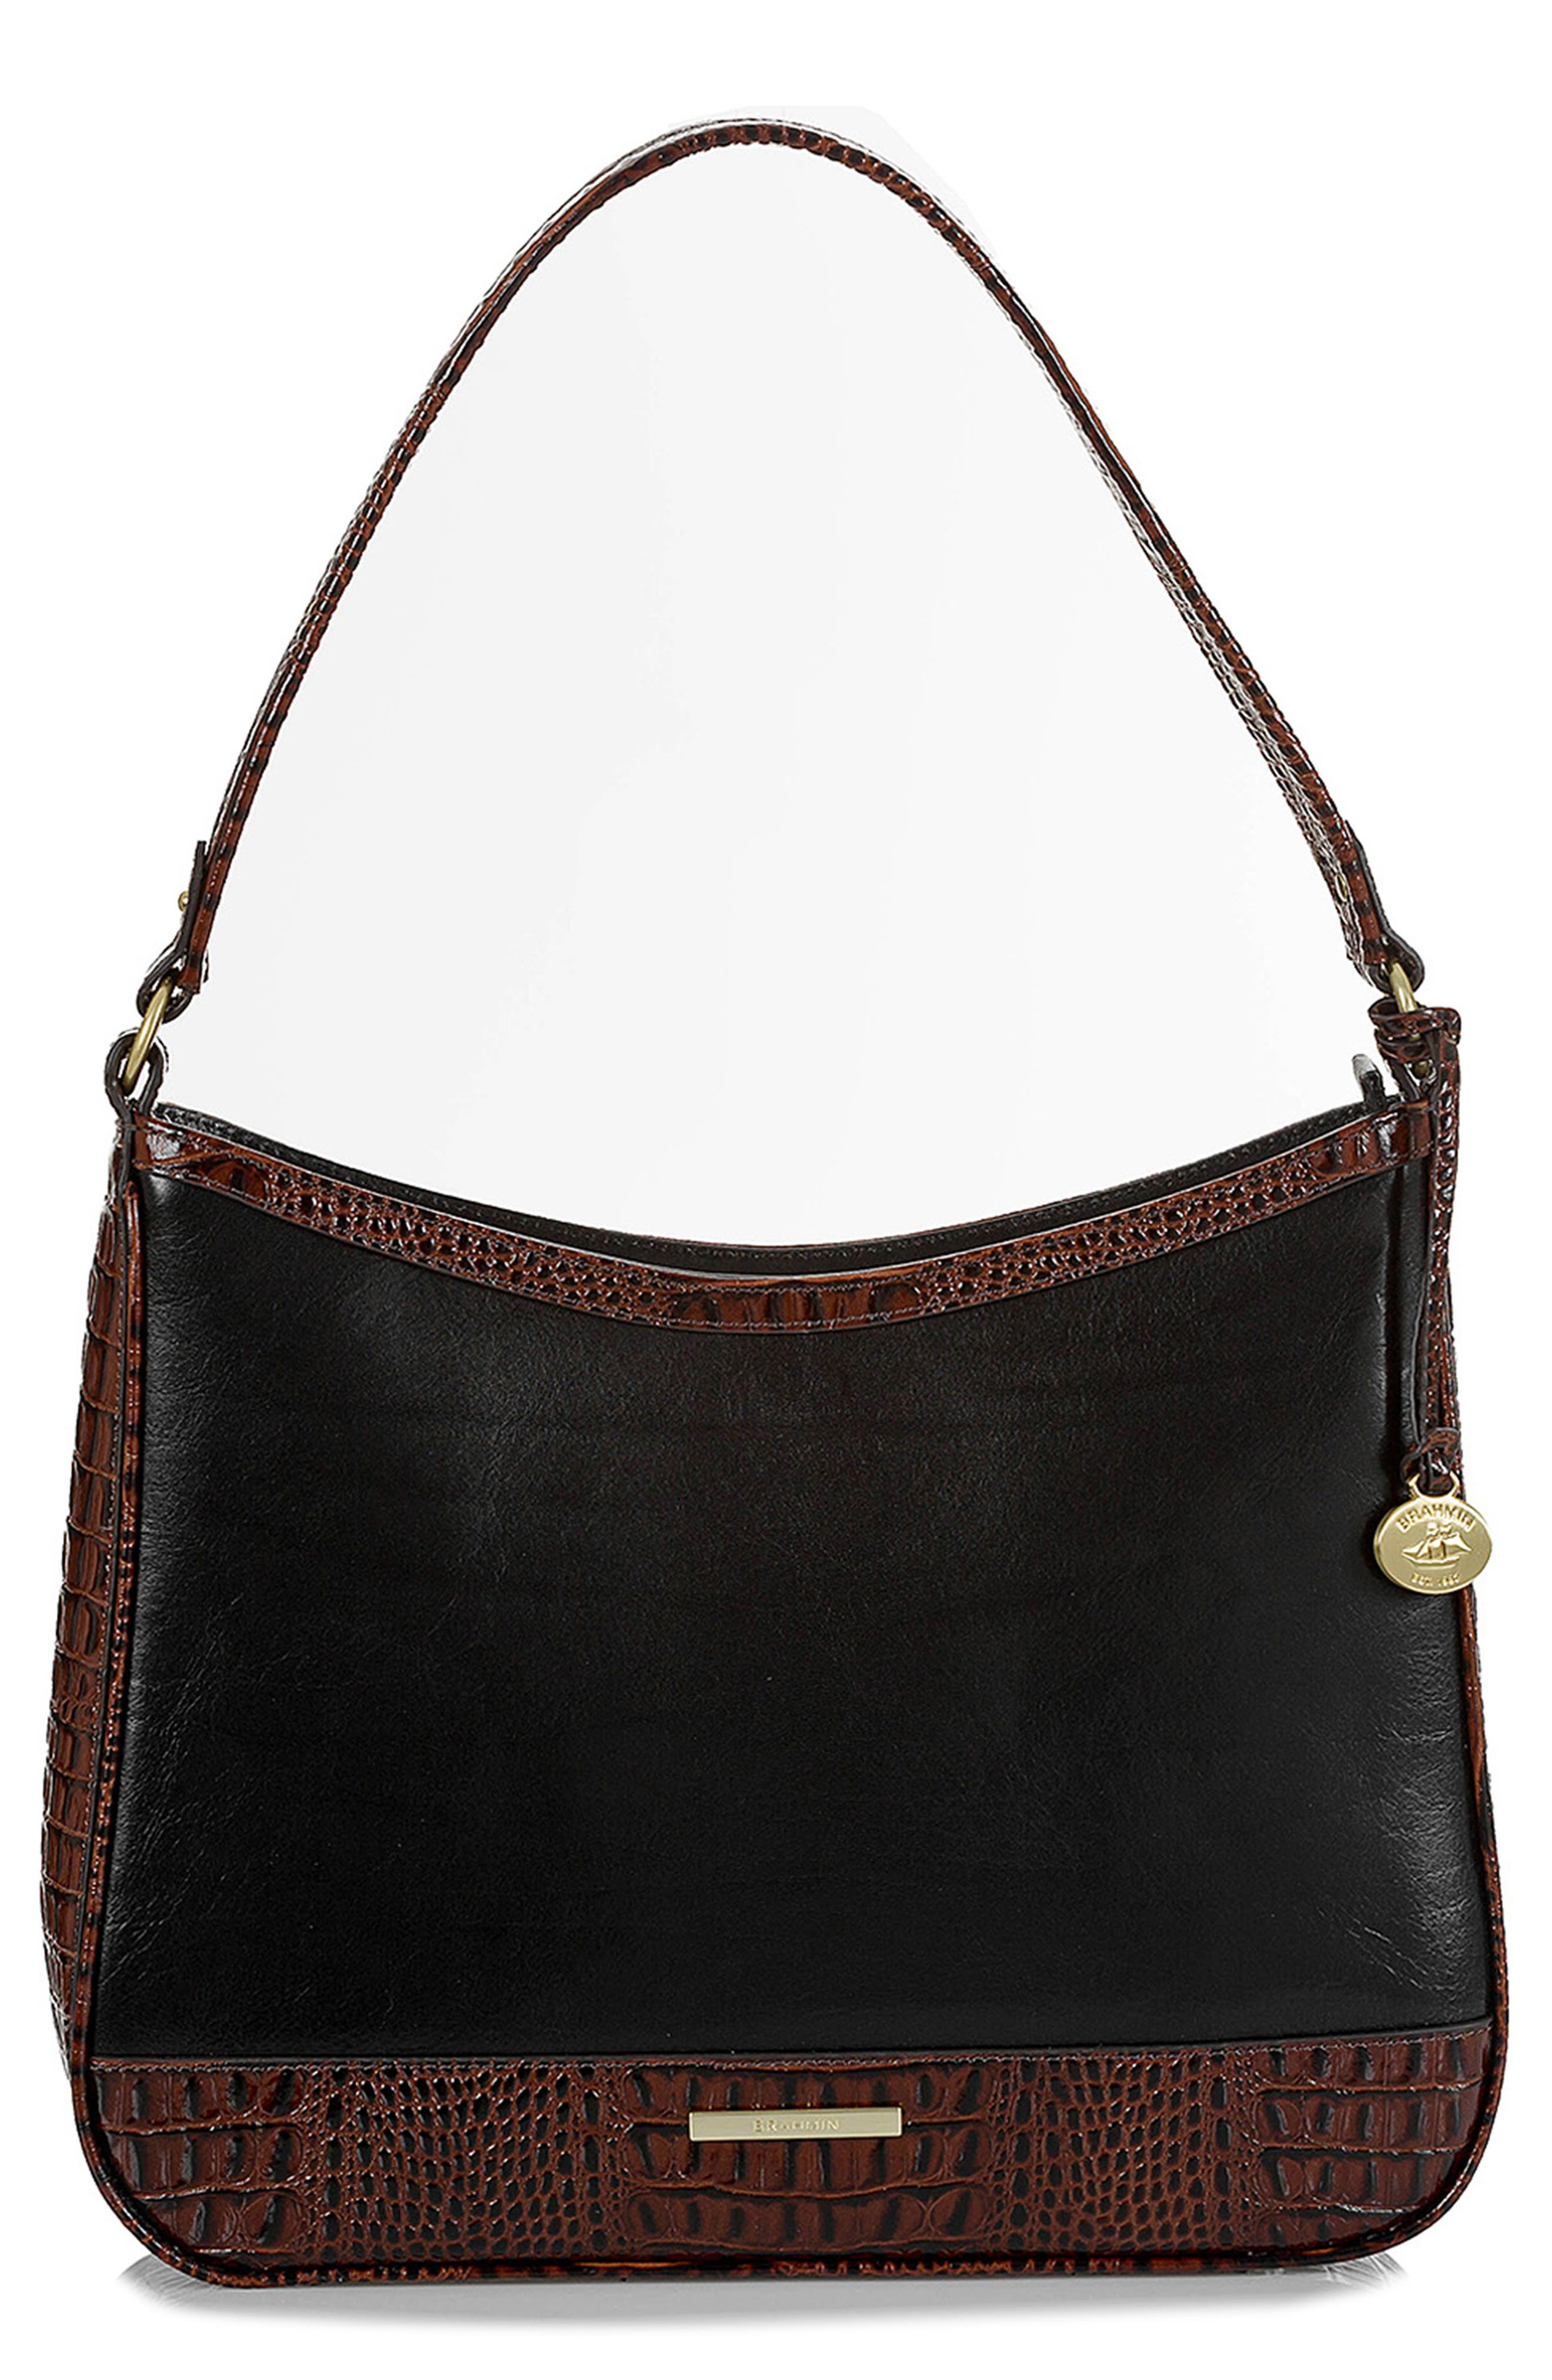 BRAHMIN Noelle Leather Hobo Bag, Main, color, 001